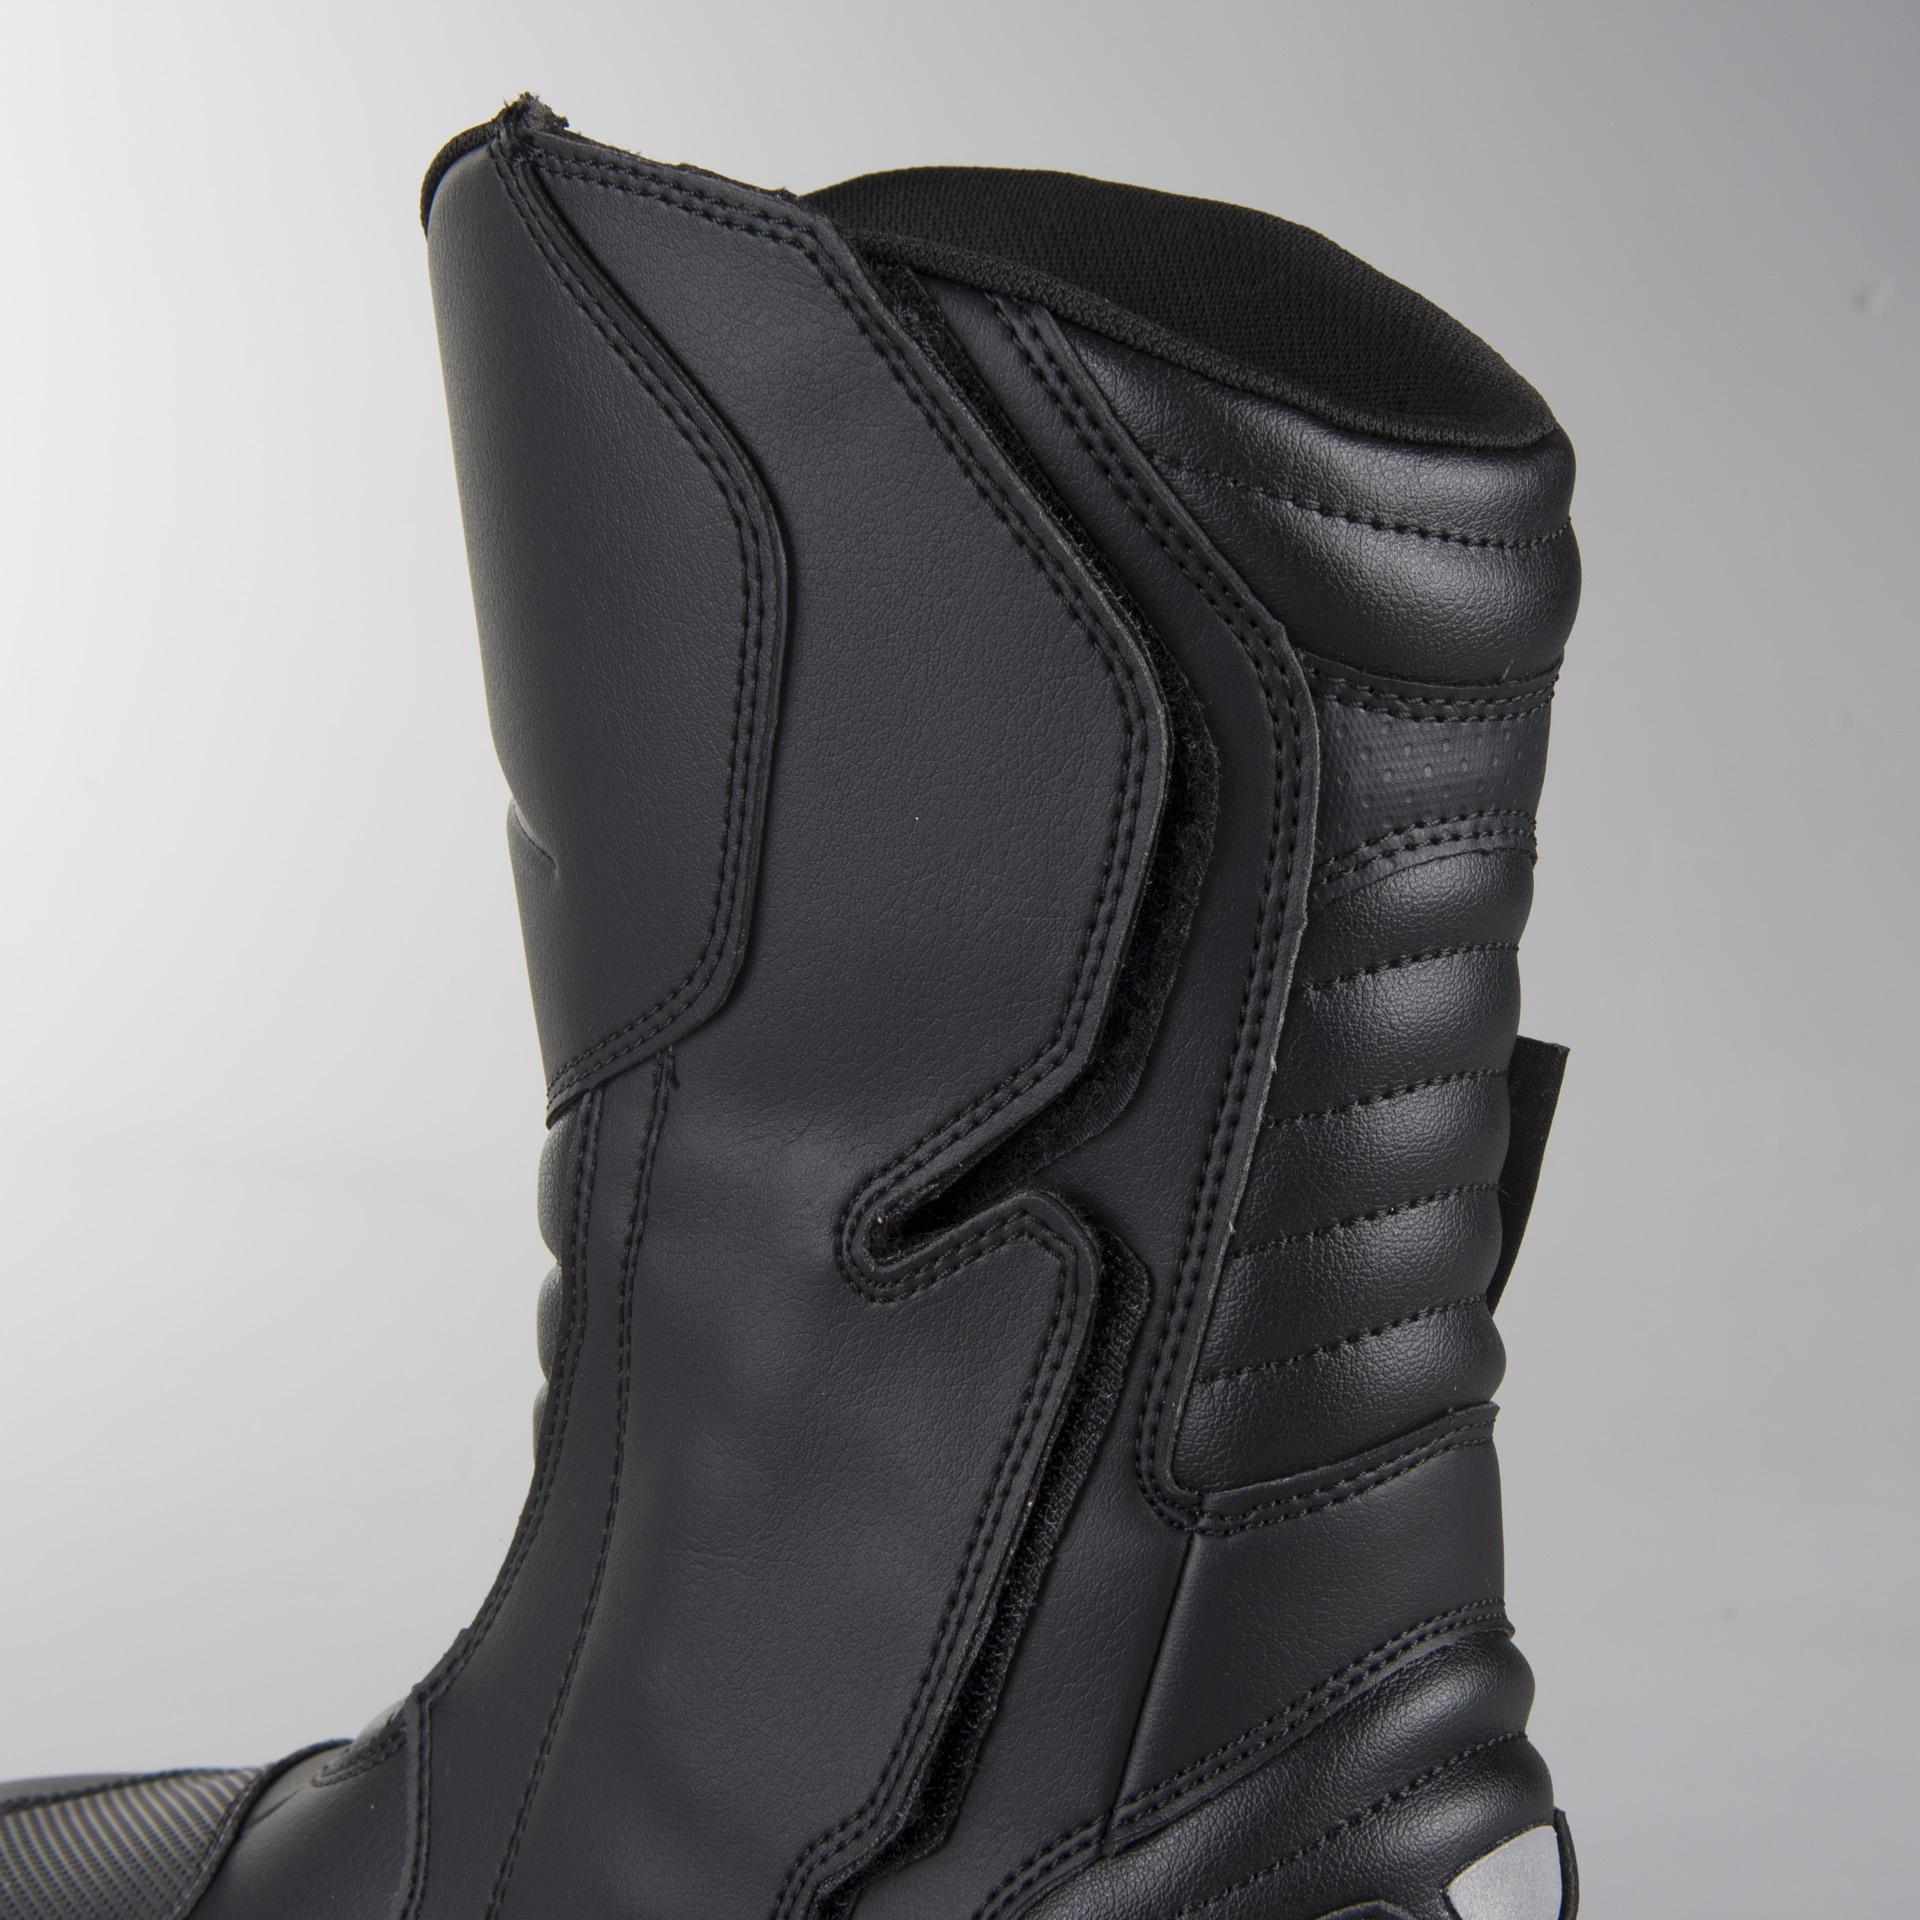 Black Motorcycle boots Alpinestars Radon Drystar Black 40